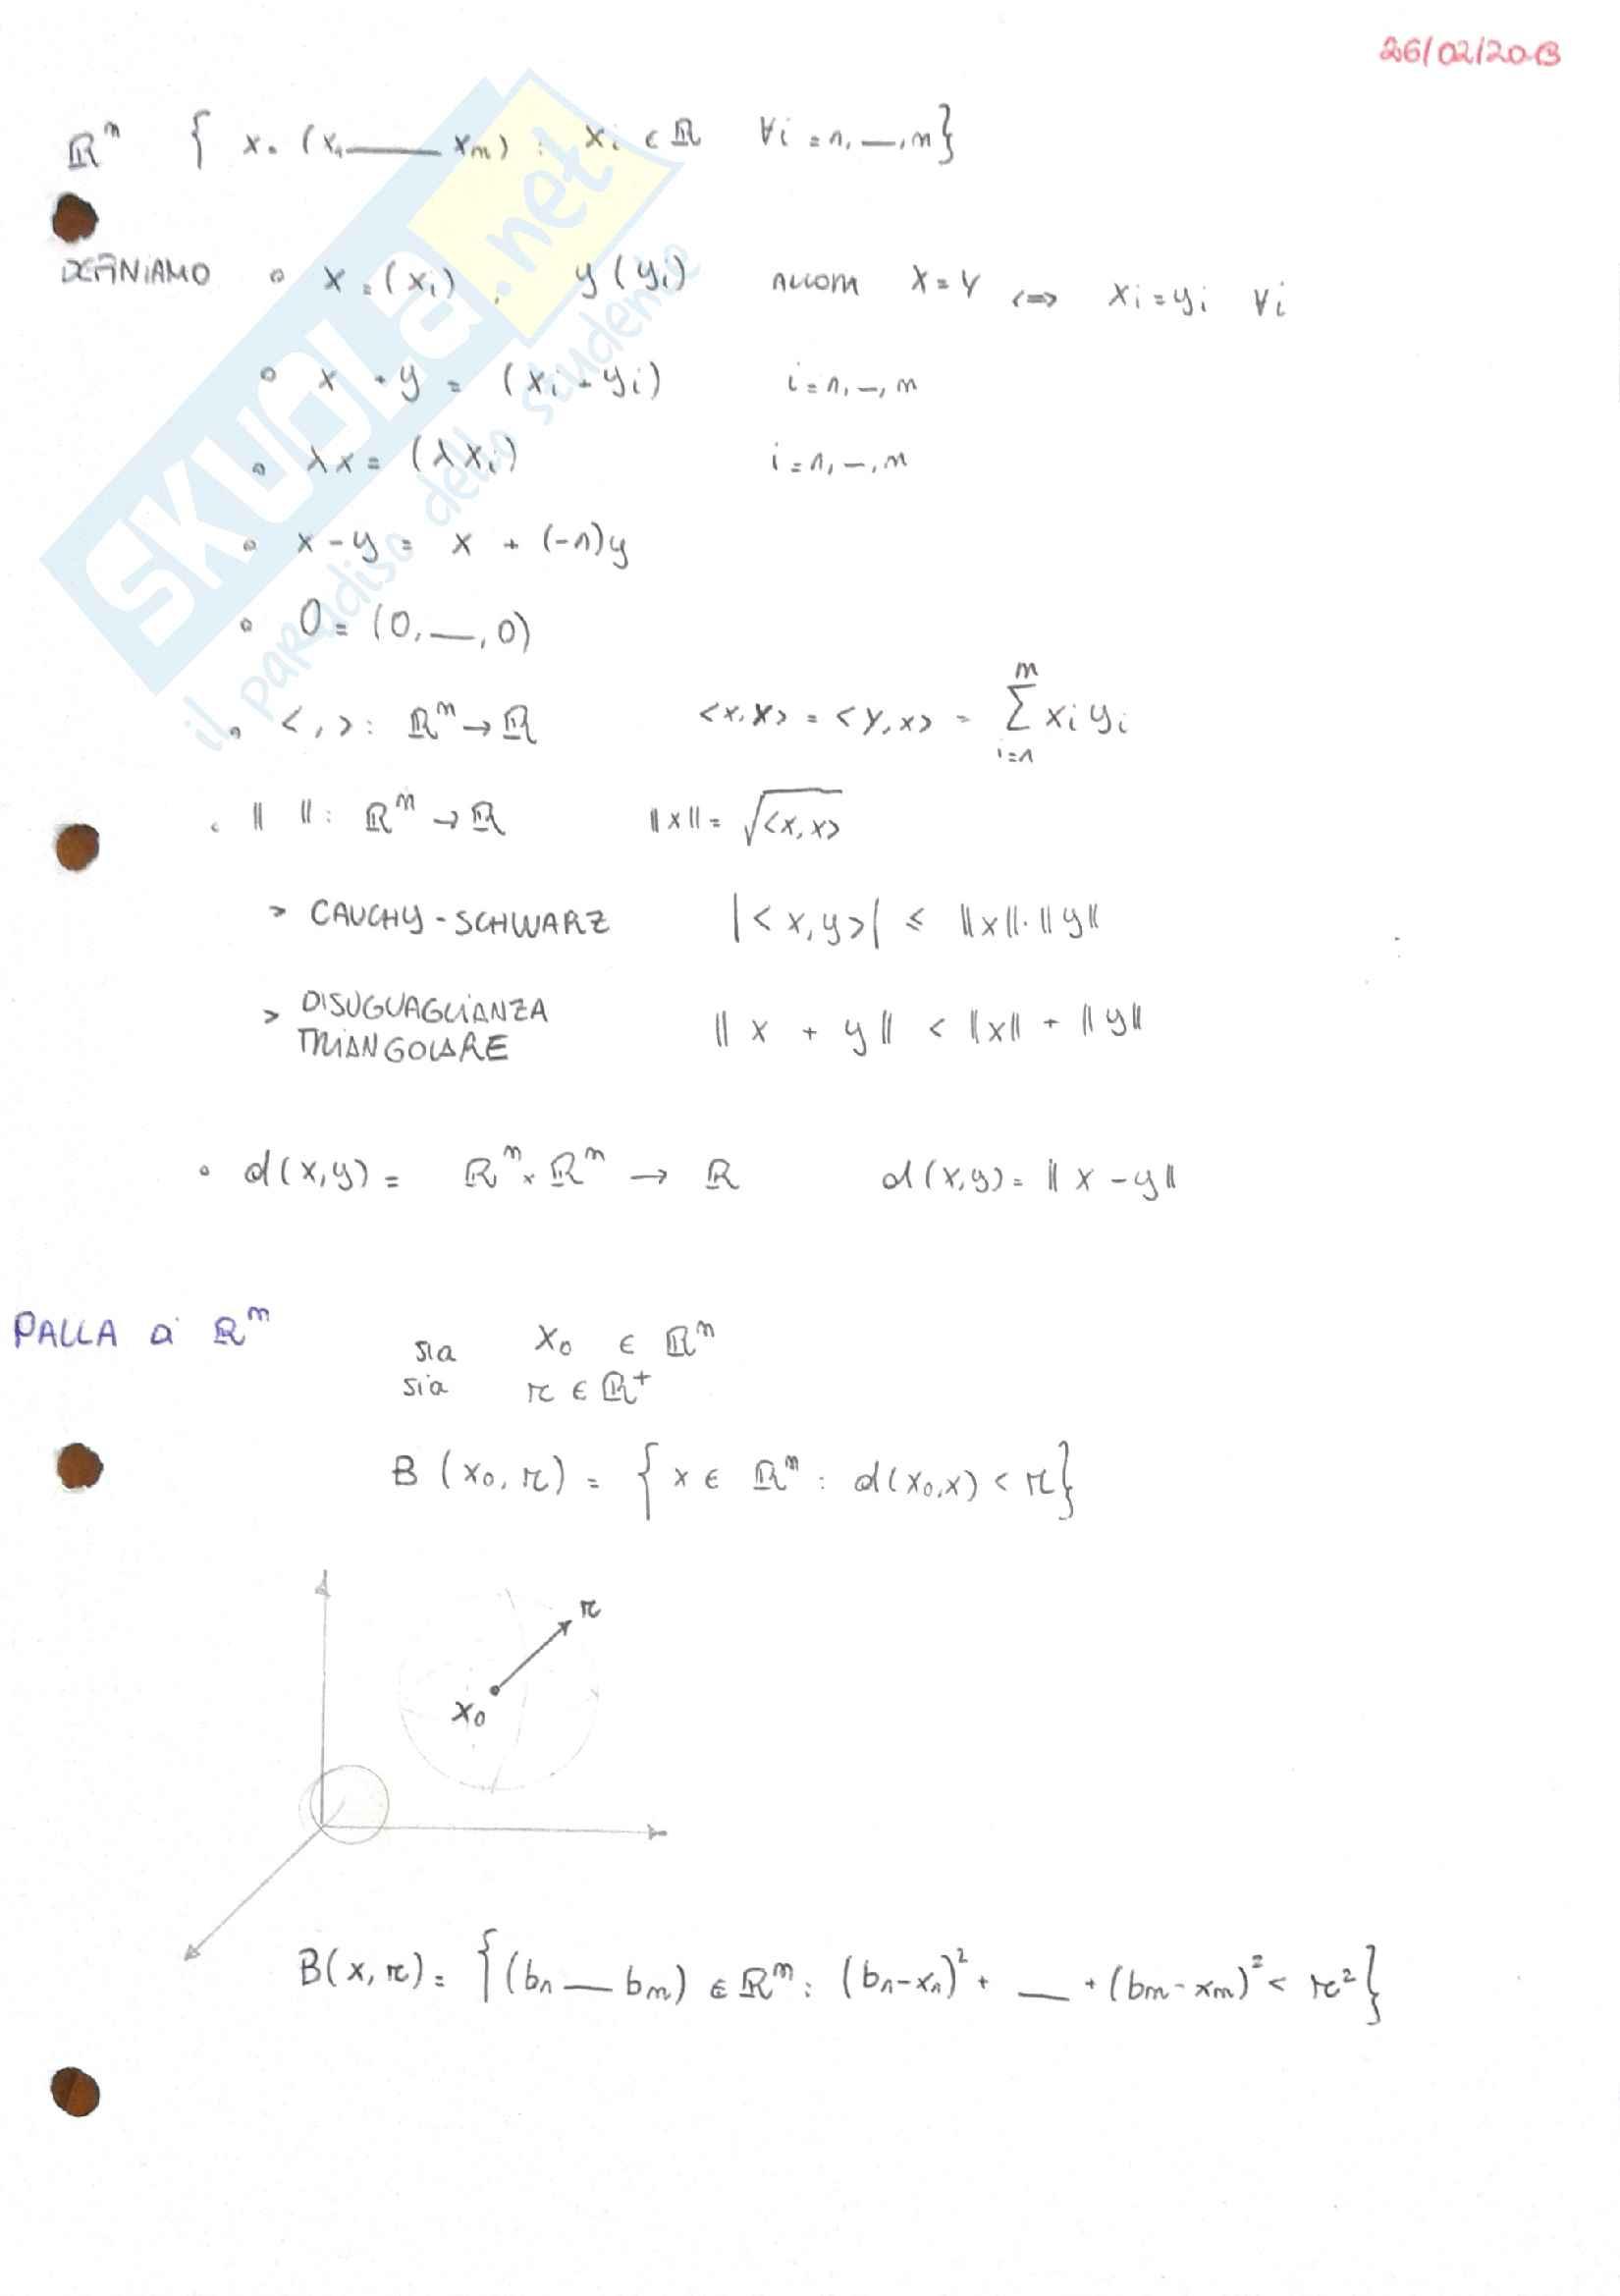 Appunti teorici di Analisi II per ingegneria